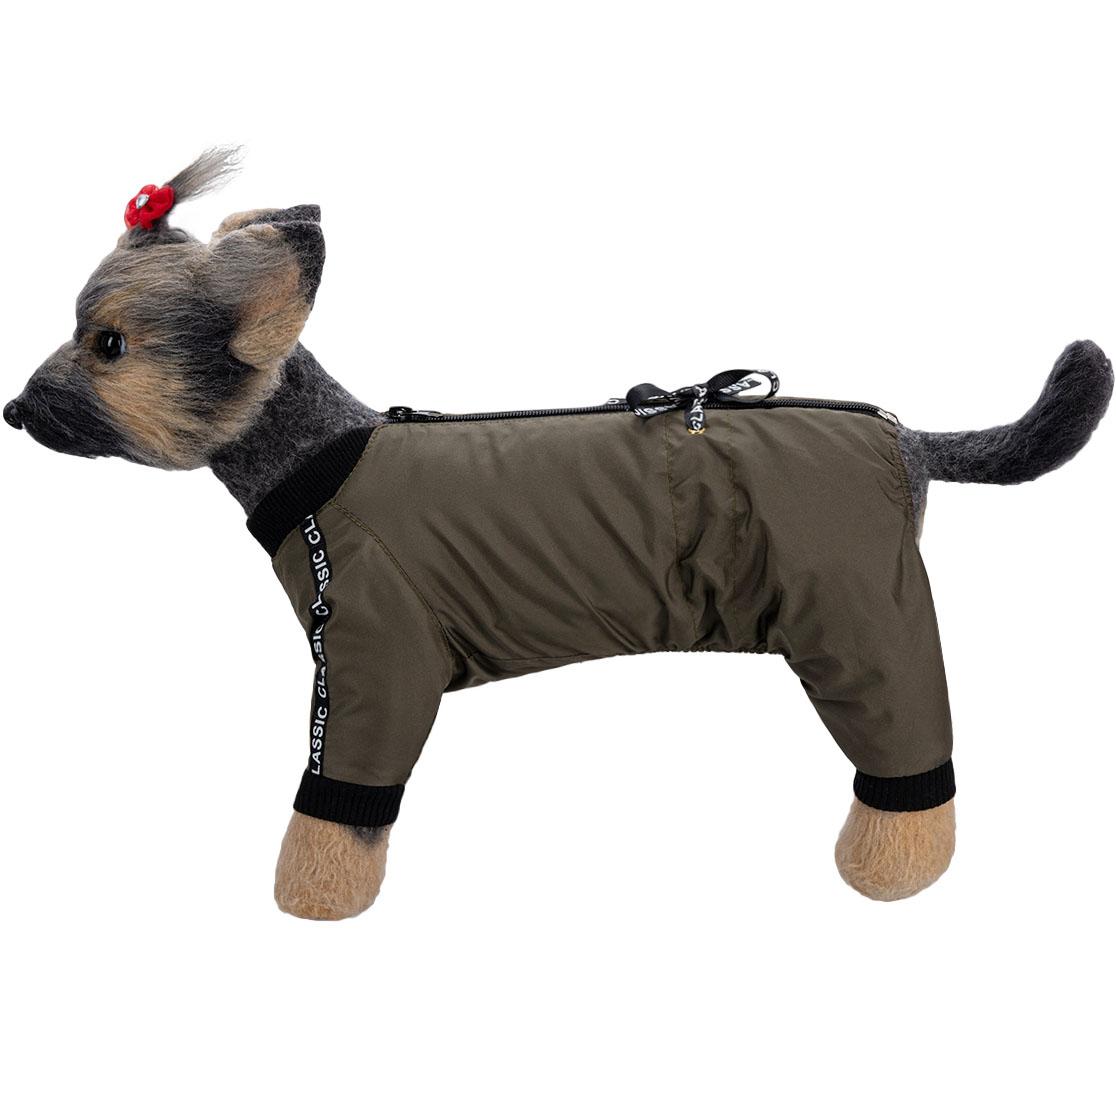 Комбинезон для собак Dogmoda Классик унисекс 3 28 см.